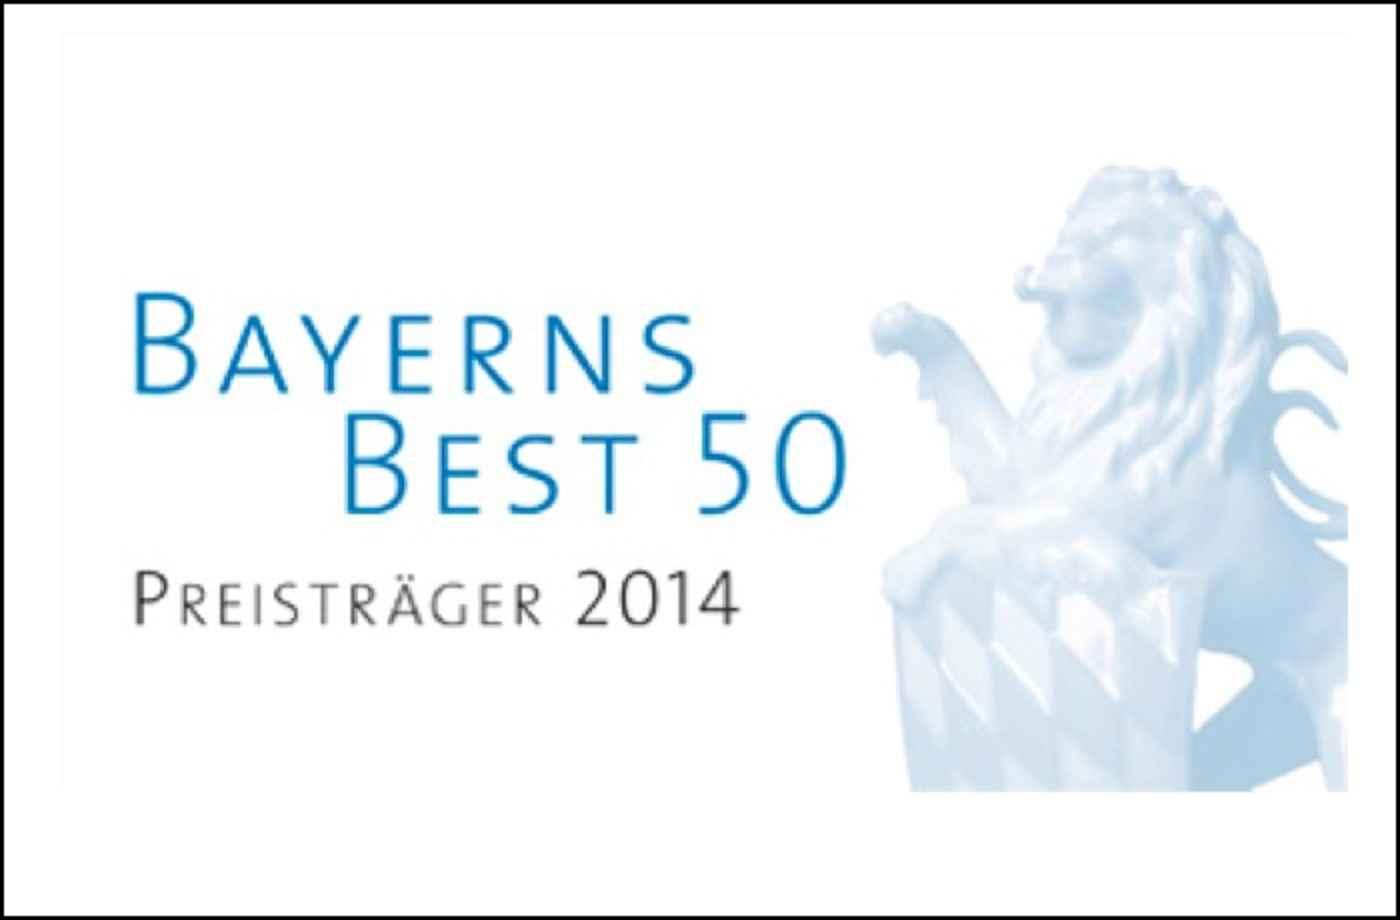 mairec edelmetall precious metal recycling auszeichnung bayerns best 50 award